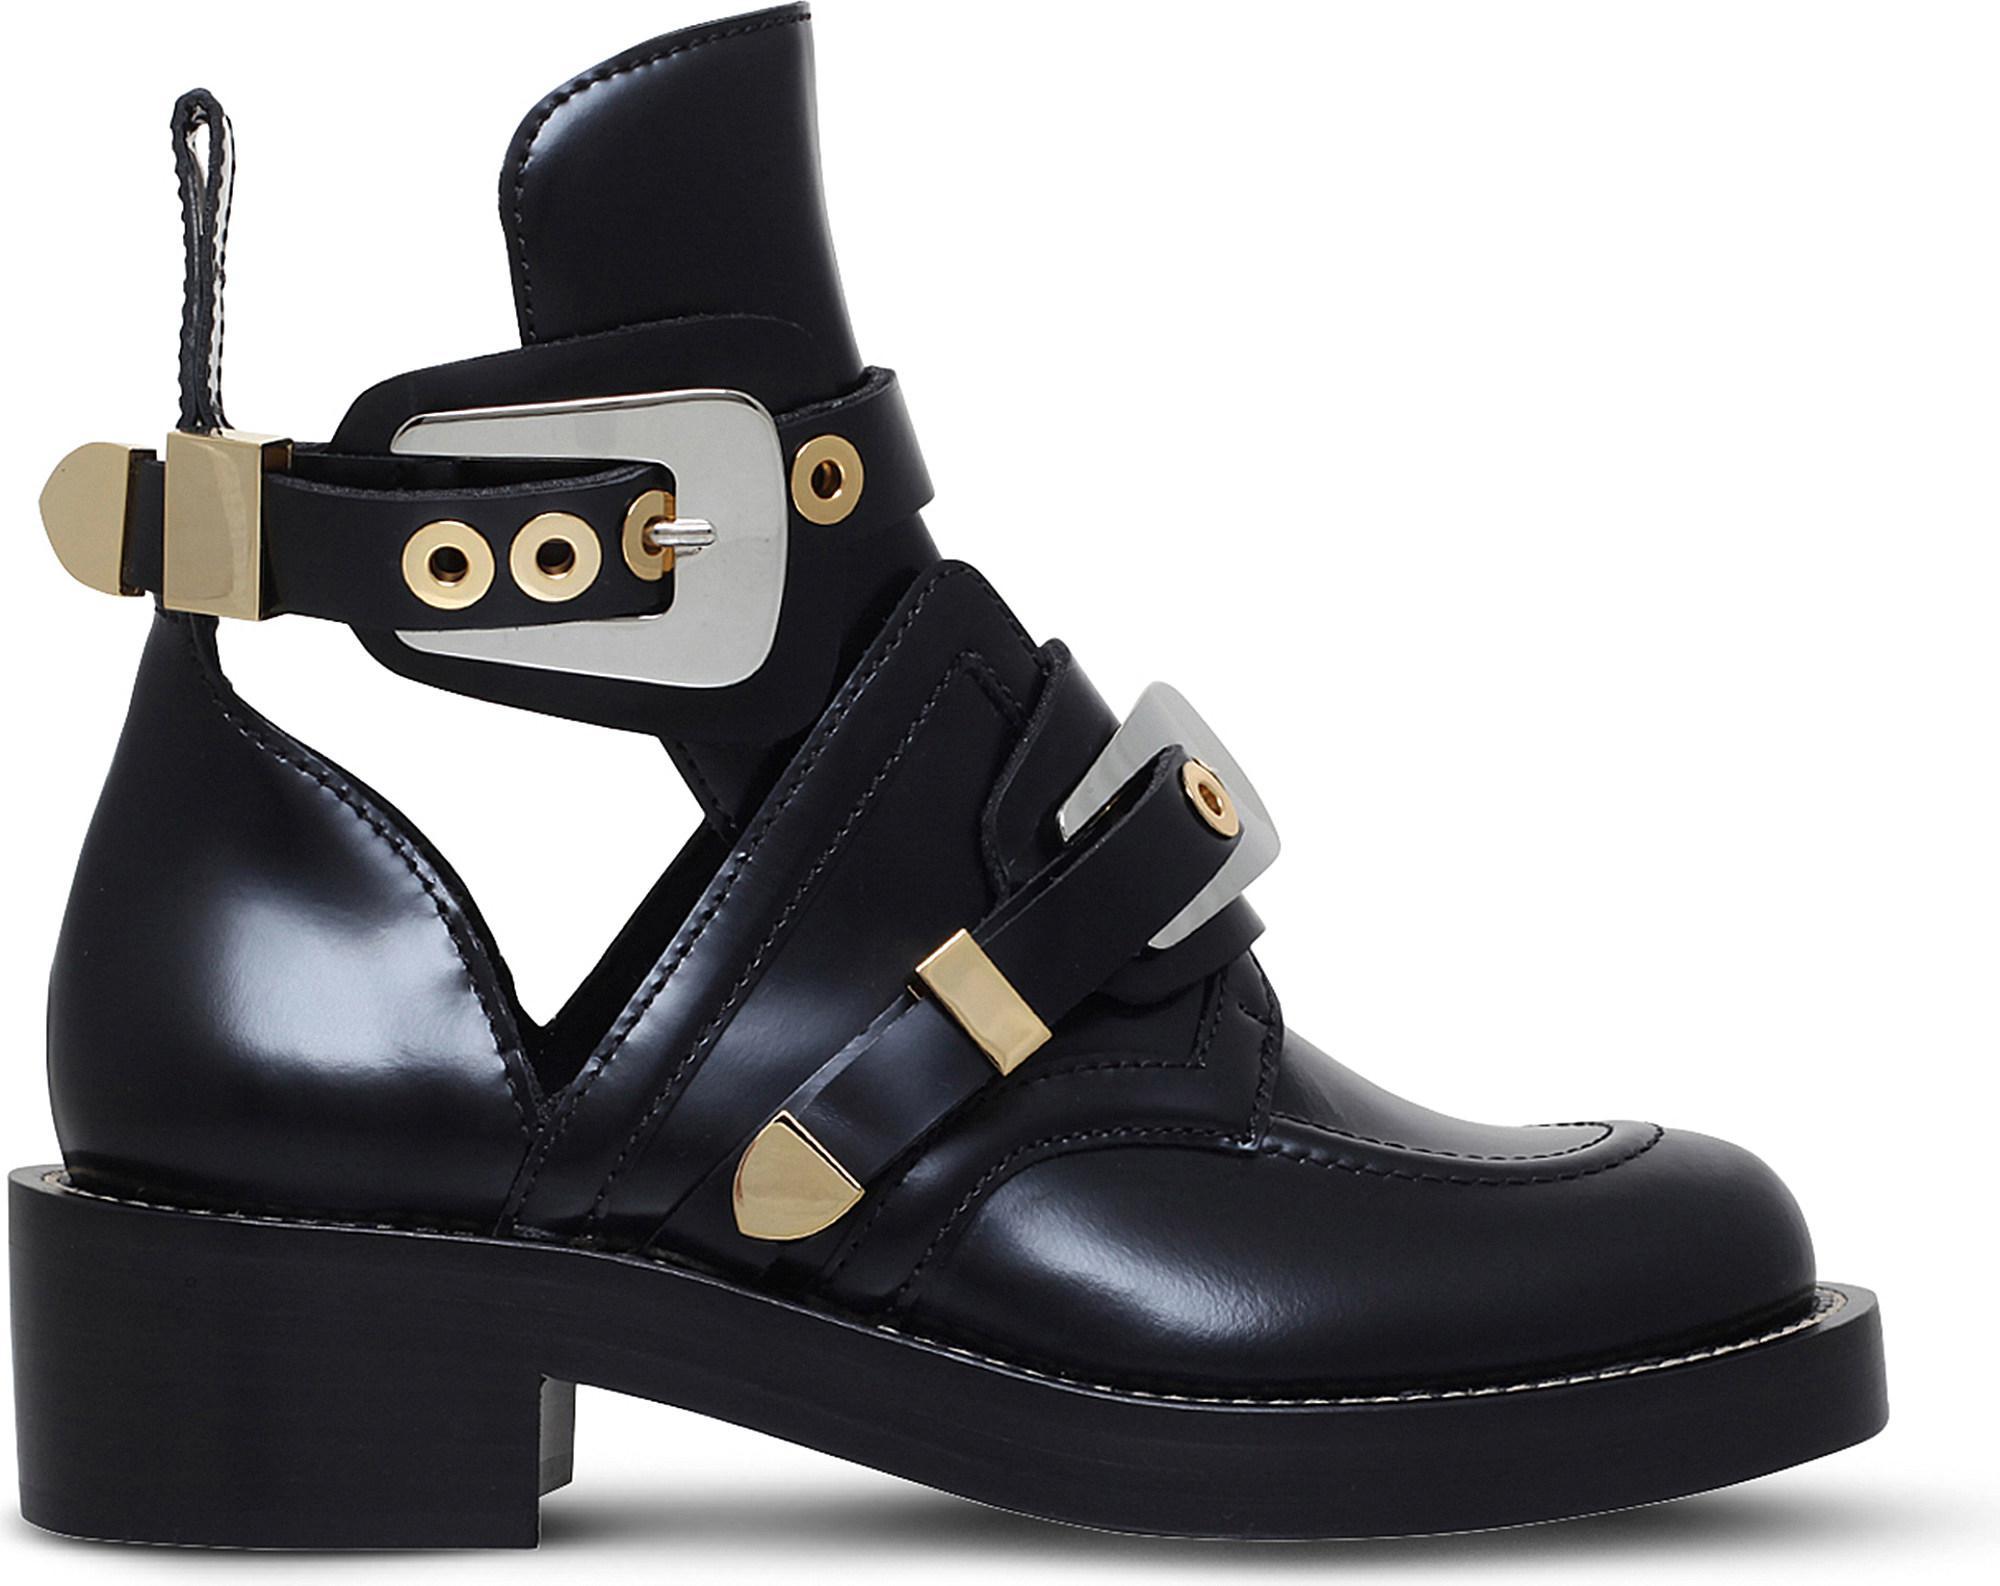 5806dddd185a Lyst - Balenciaga Women s Ceinture Ankle Boots in Black - Save 40%